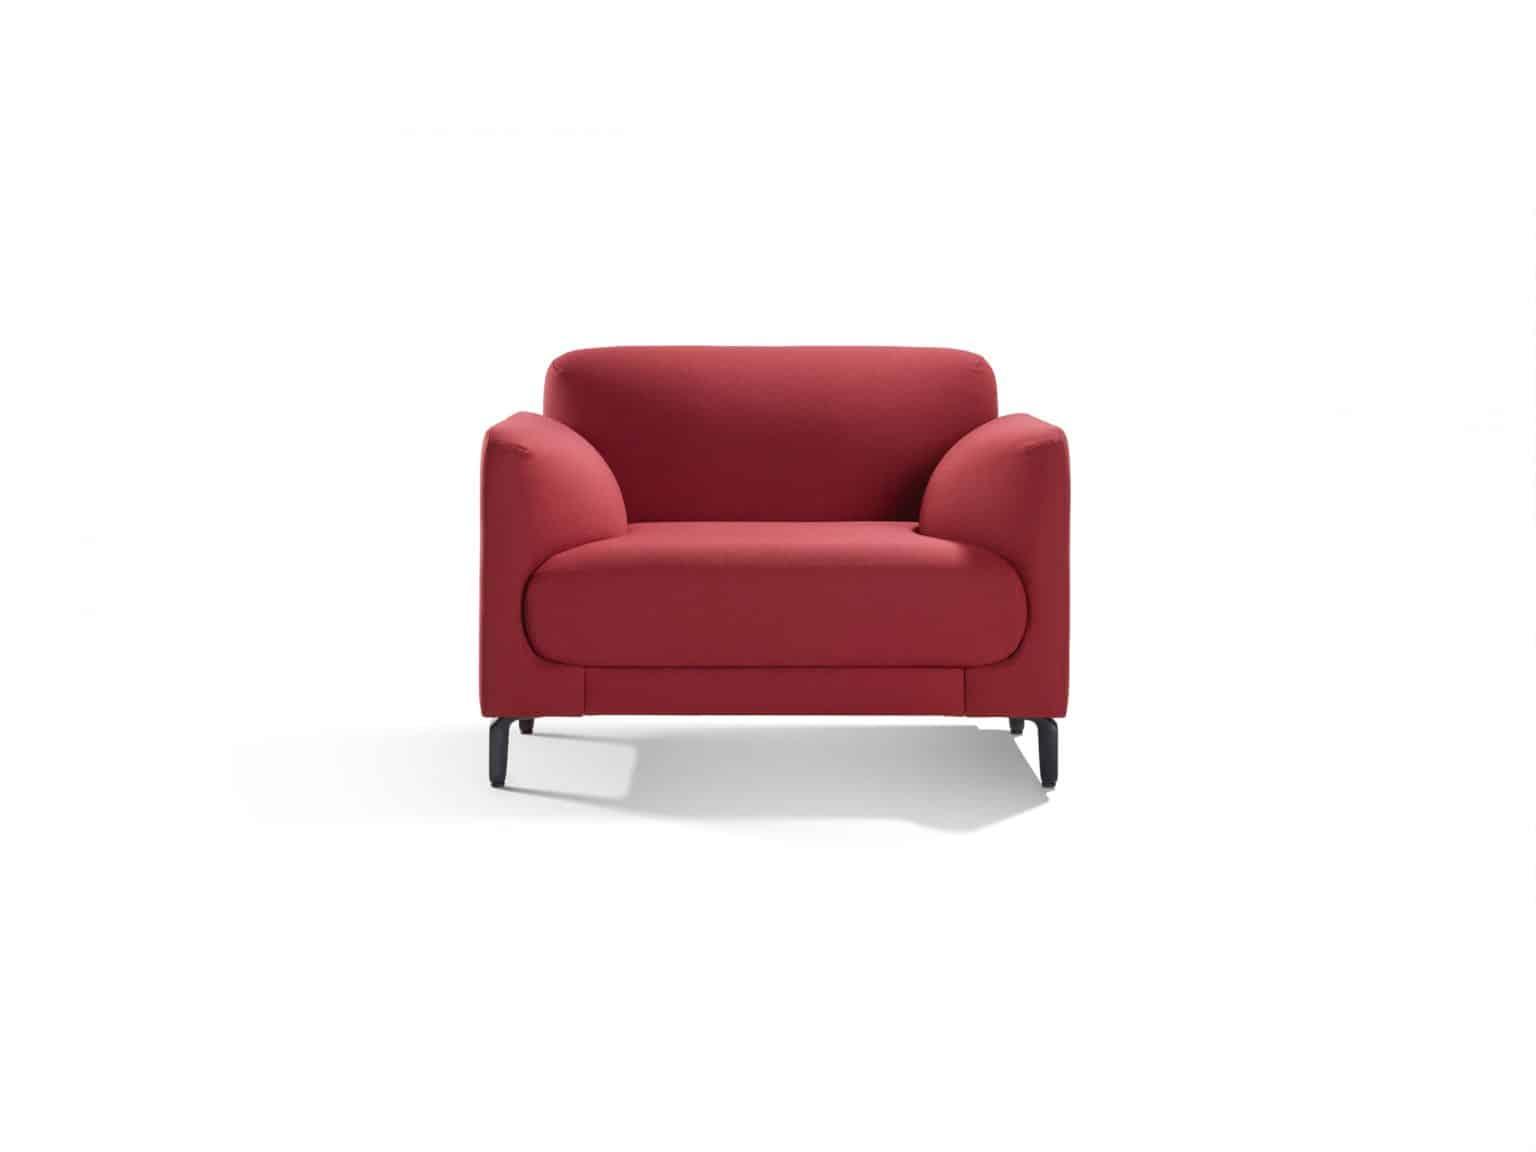 Artifort fauteuil Figura pa